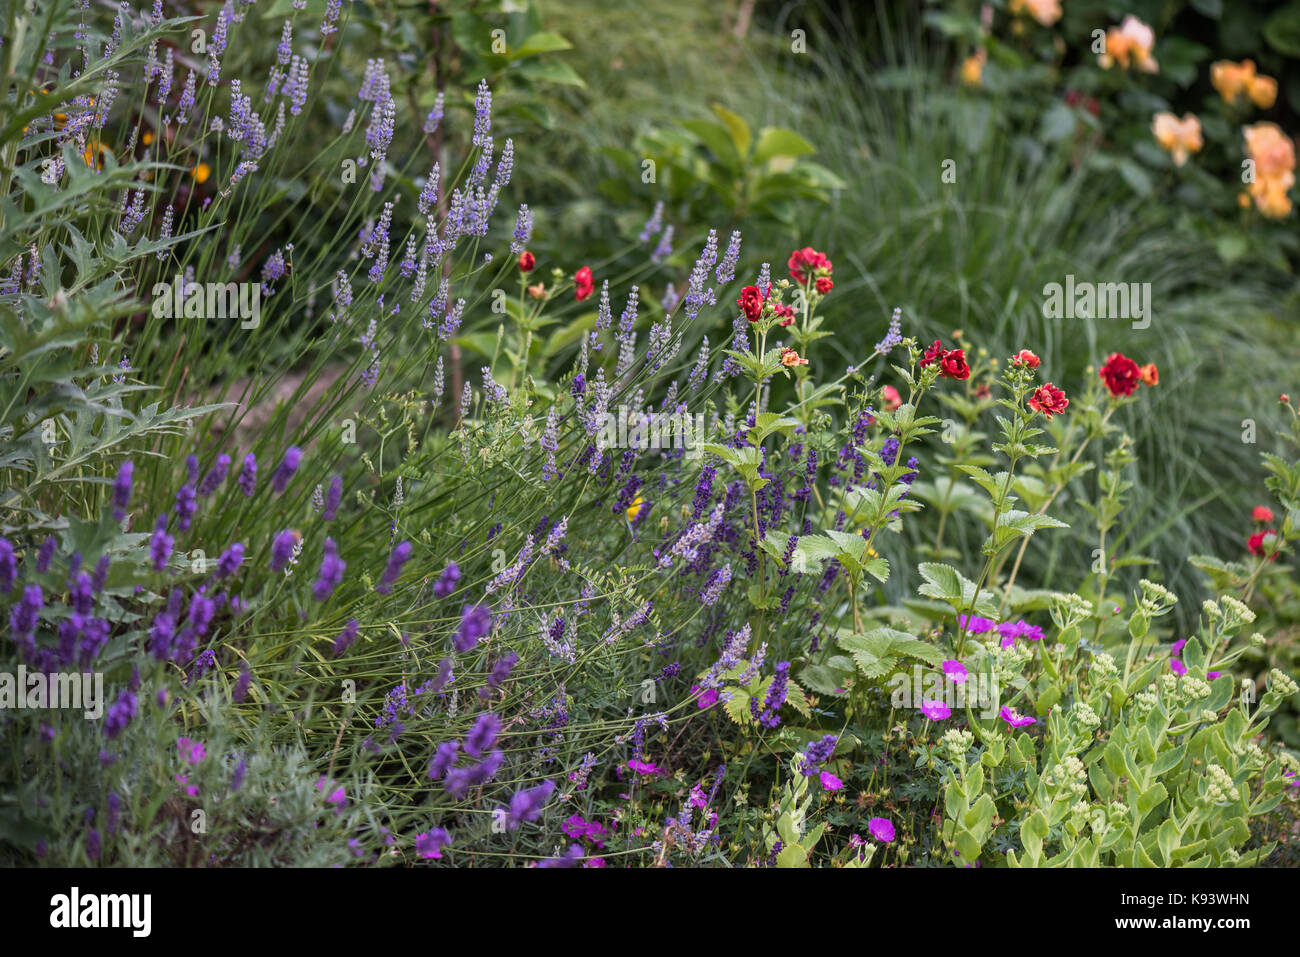 garden flowers, perennials, Hamburg, Germany - Stock Image